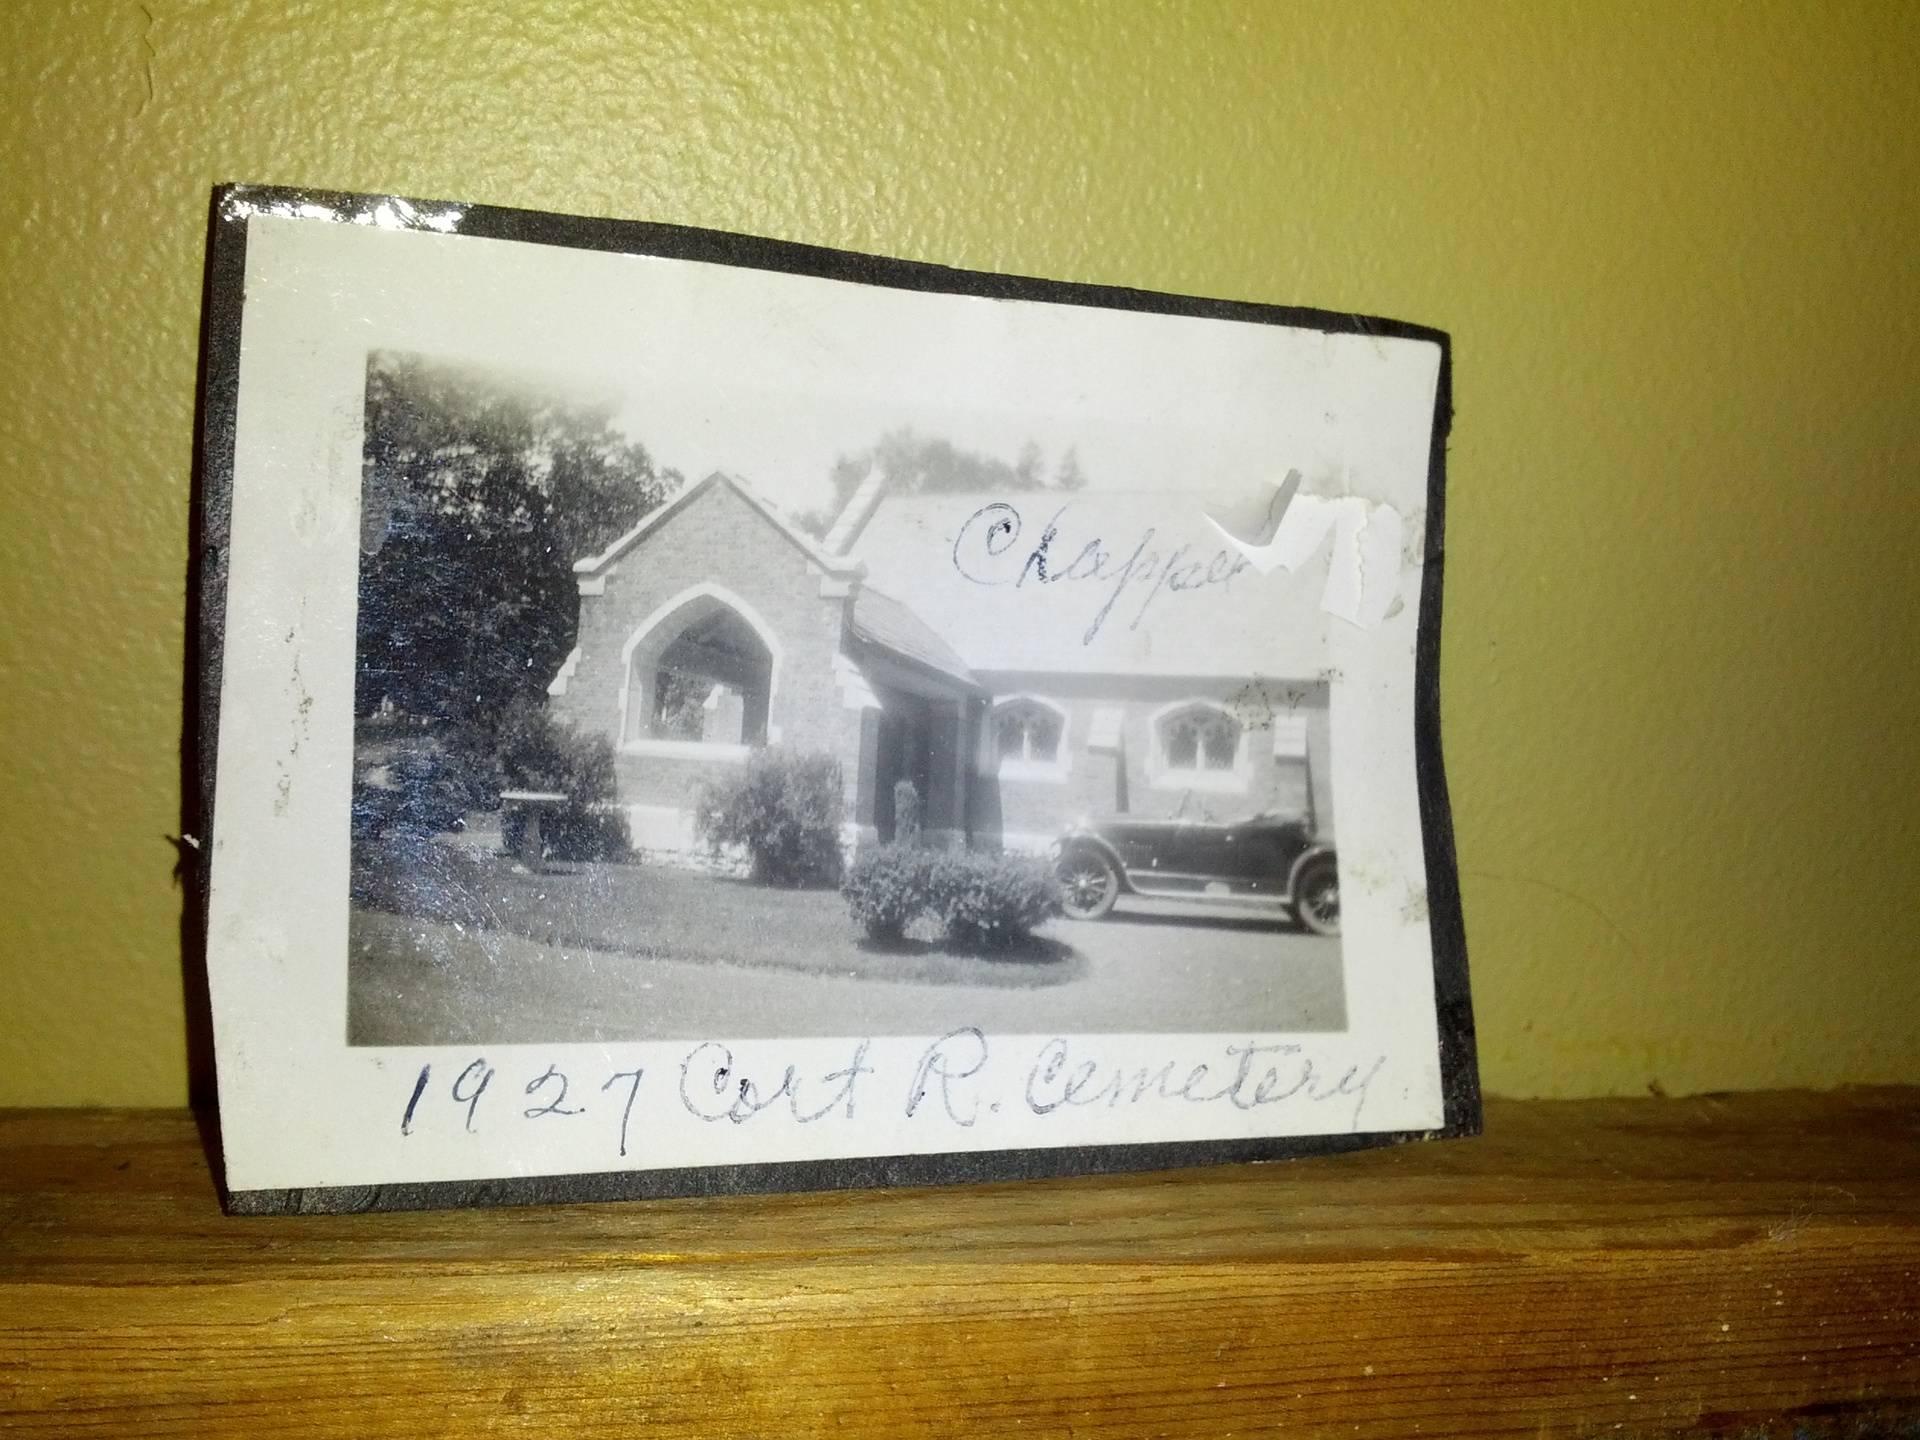 Cortland Rural Cemetery Chapel -- 1937